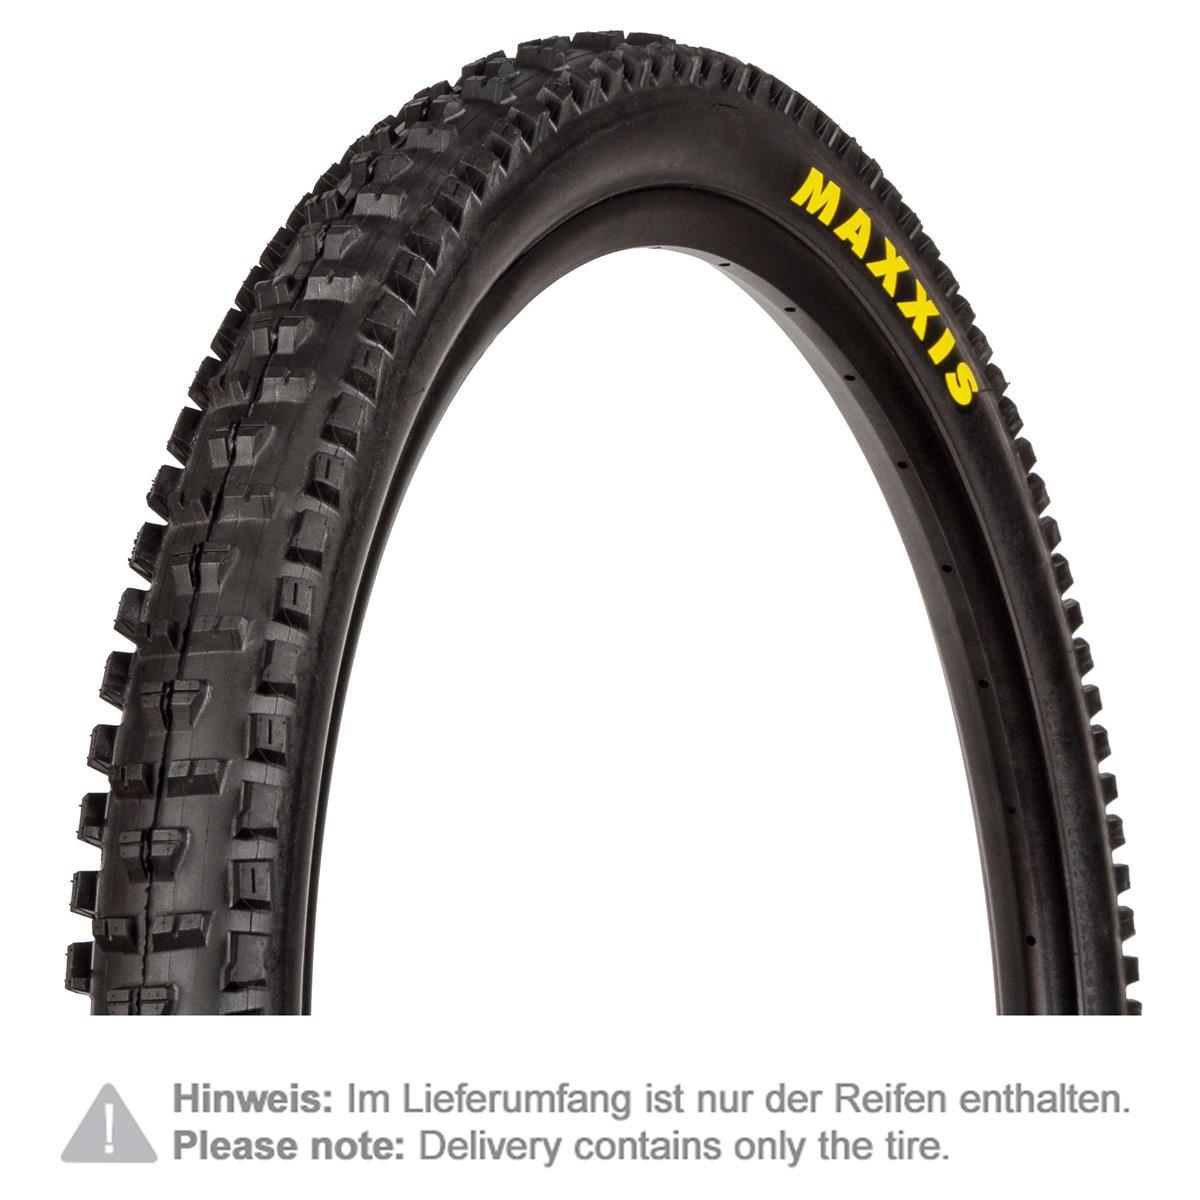 Maxxis MTB-Reifen HighRoller II Schwarz, 29 x 2.50 Zoll WT, DoubleDown, Tubeless Ready, 3C MaxxTerra, Faltbar